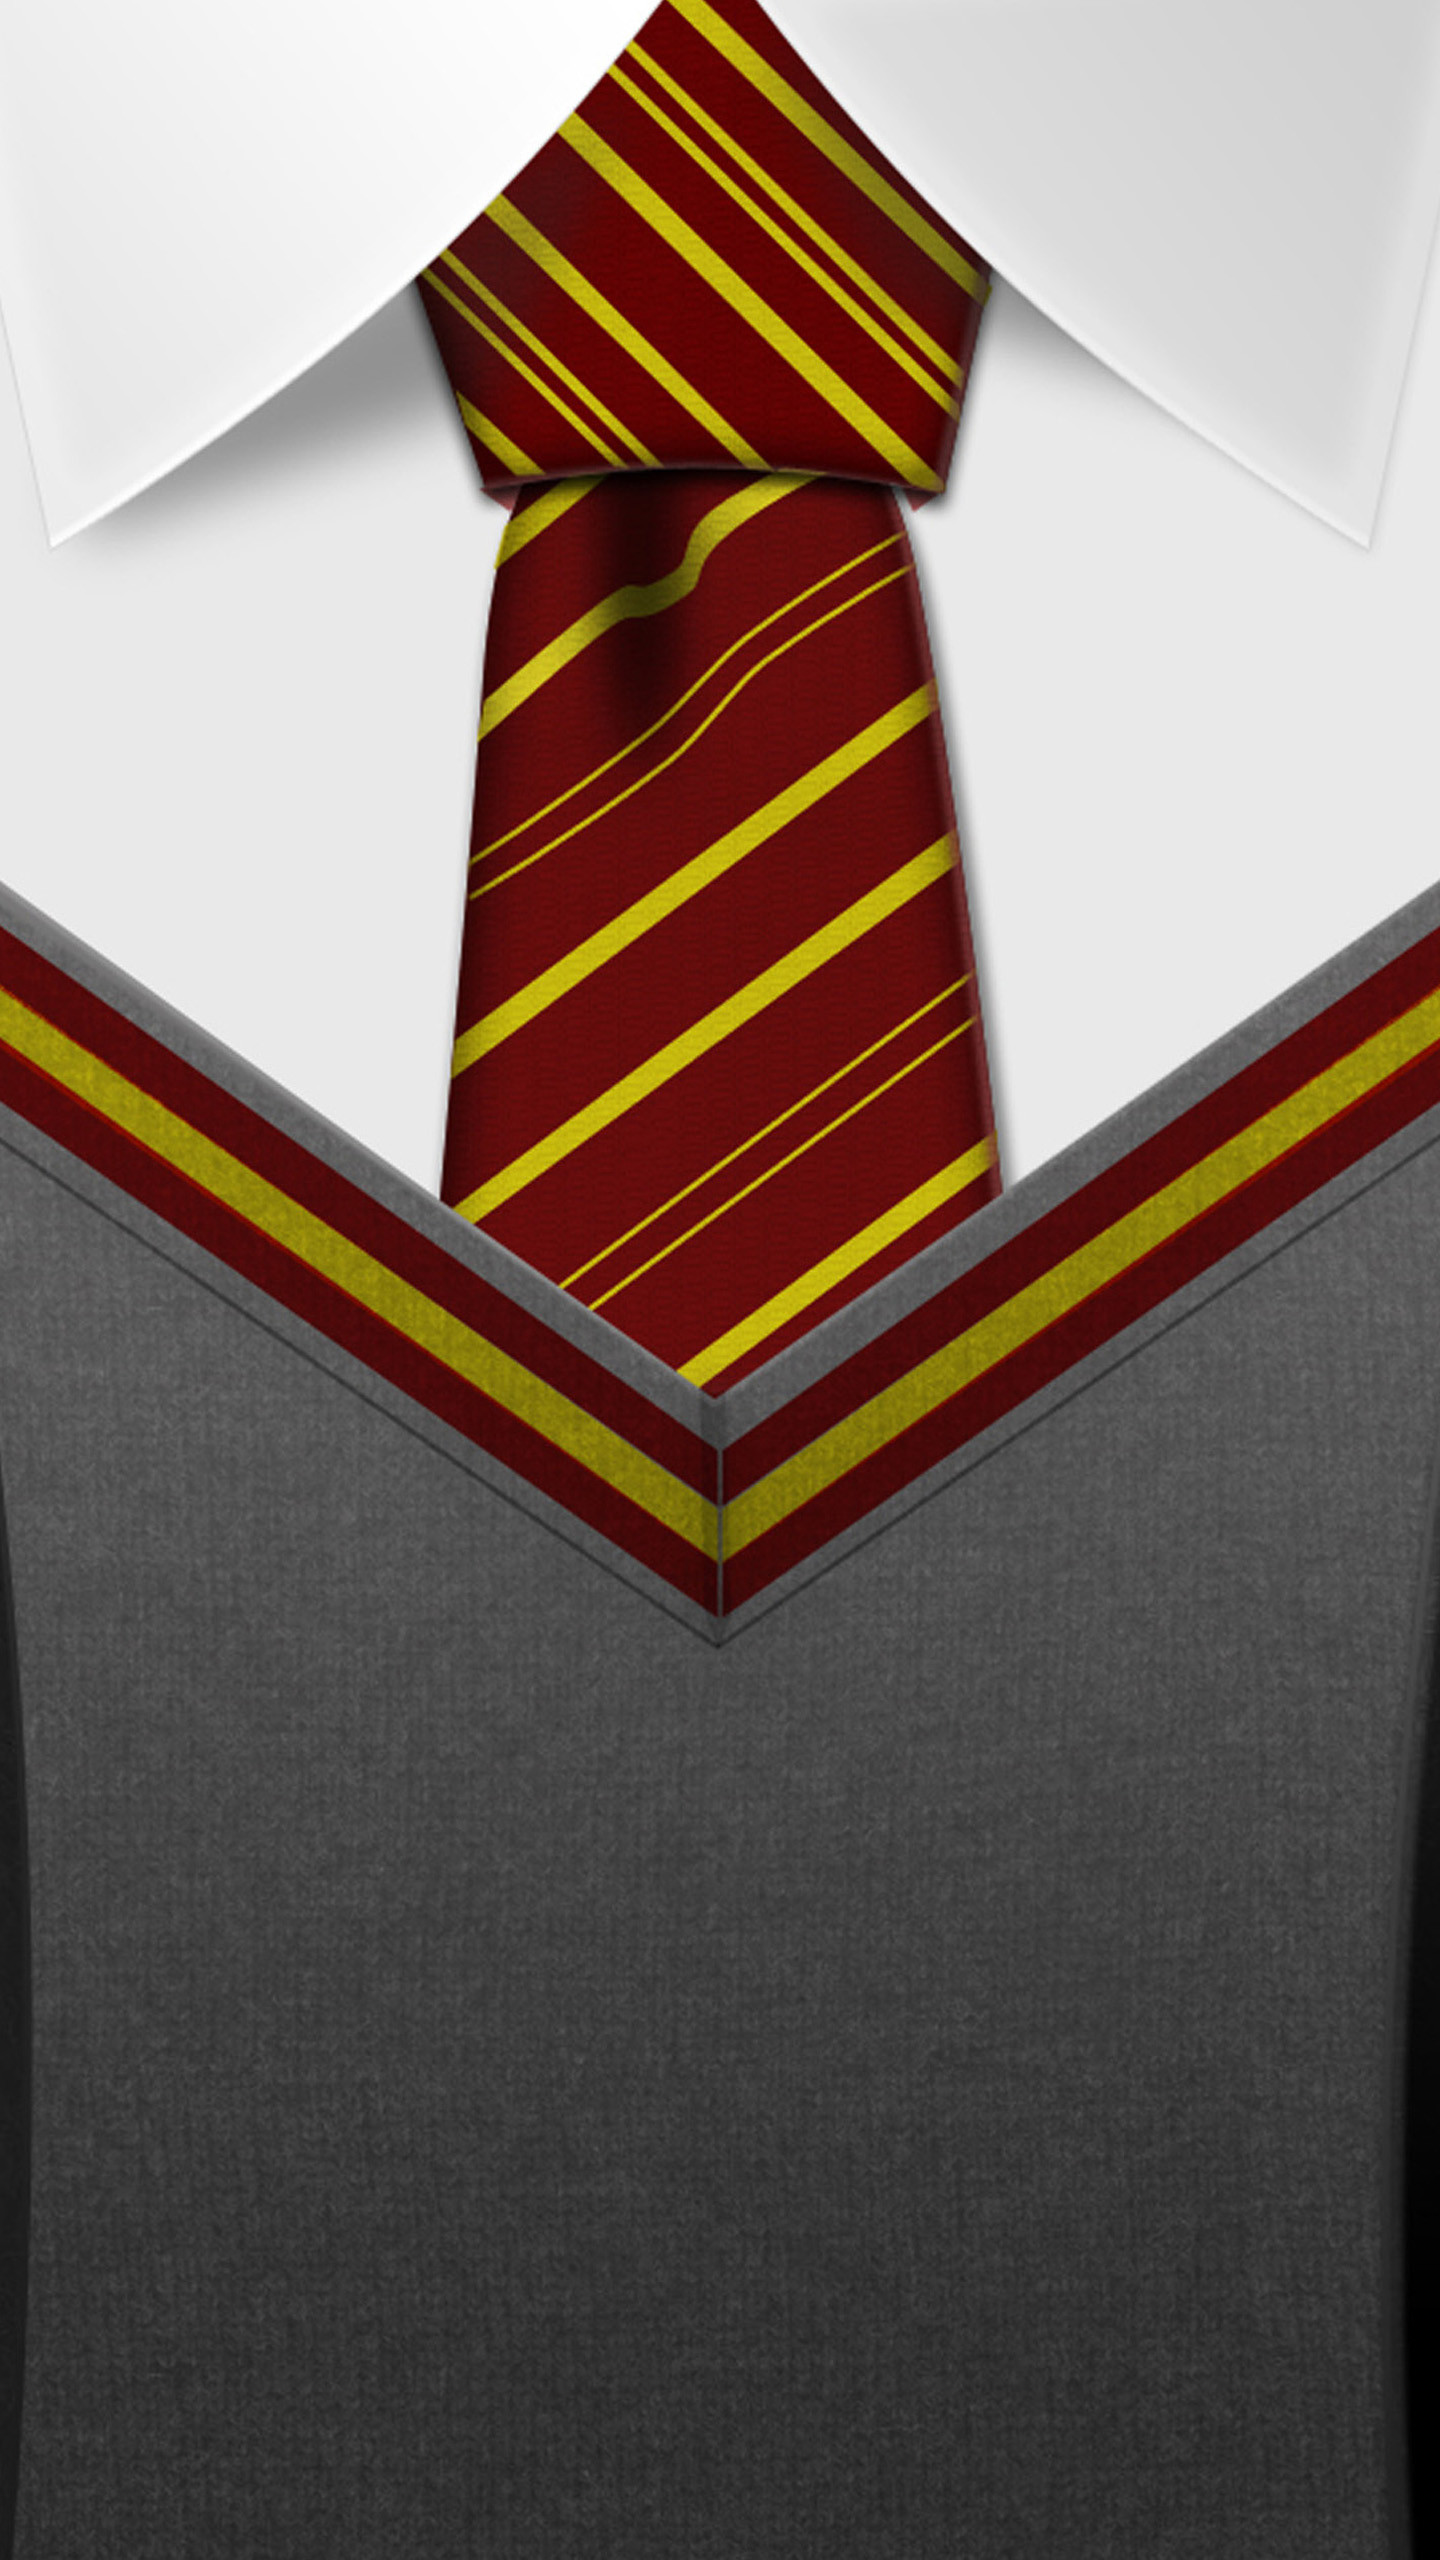 Wallpaper iphone harry potter – Harry Potter Gryffindor Tie Lg G3 Wallpapers